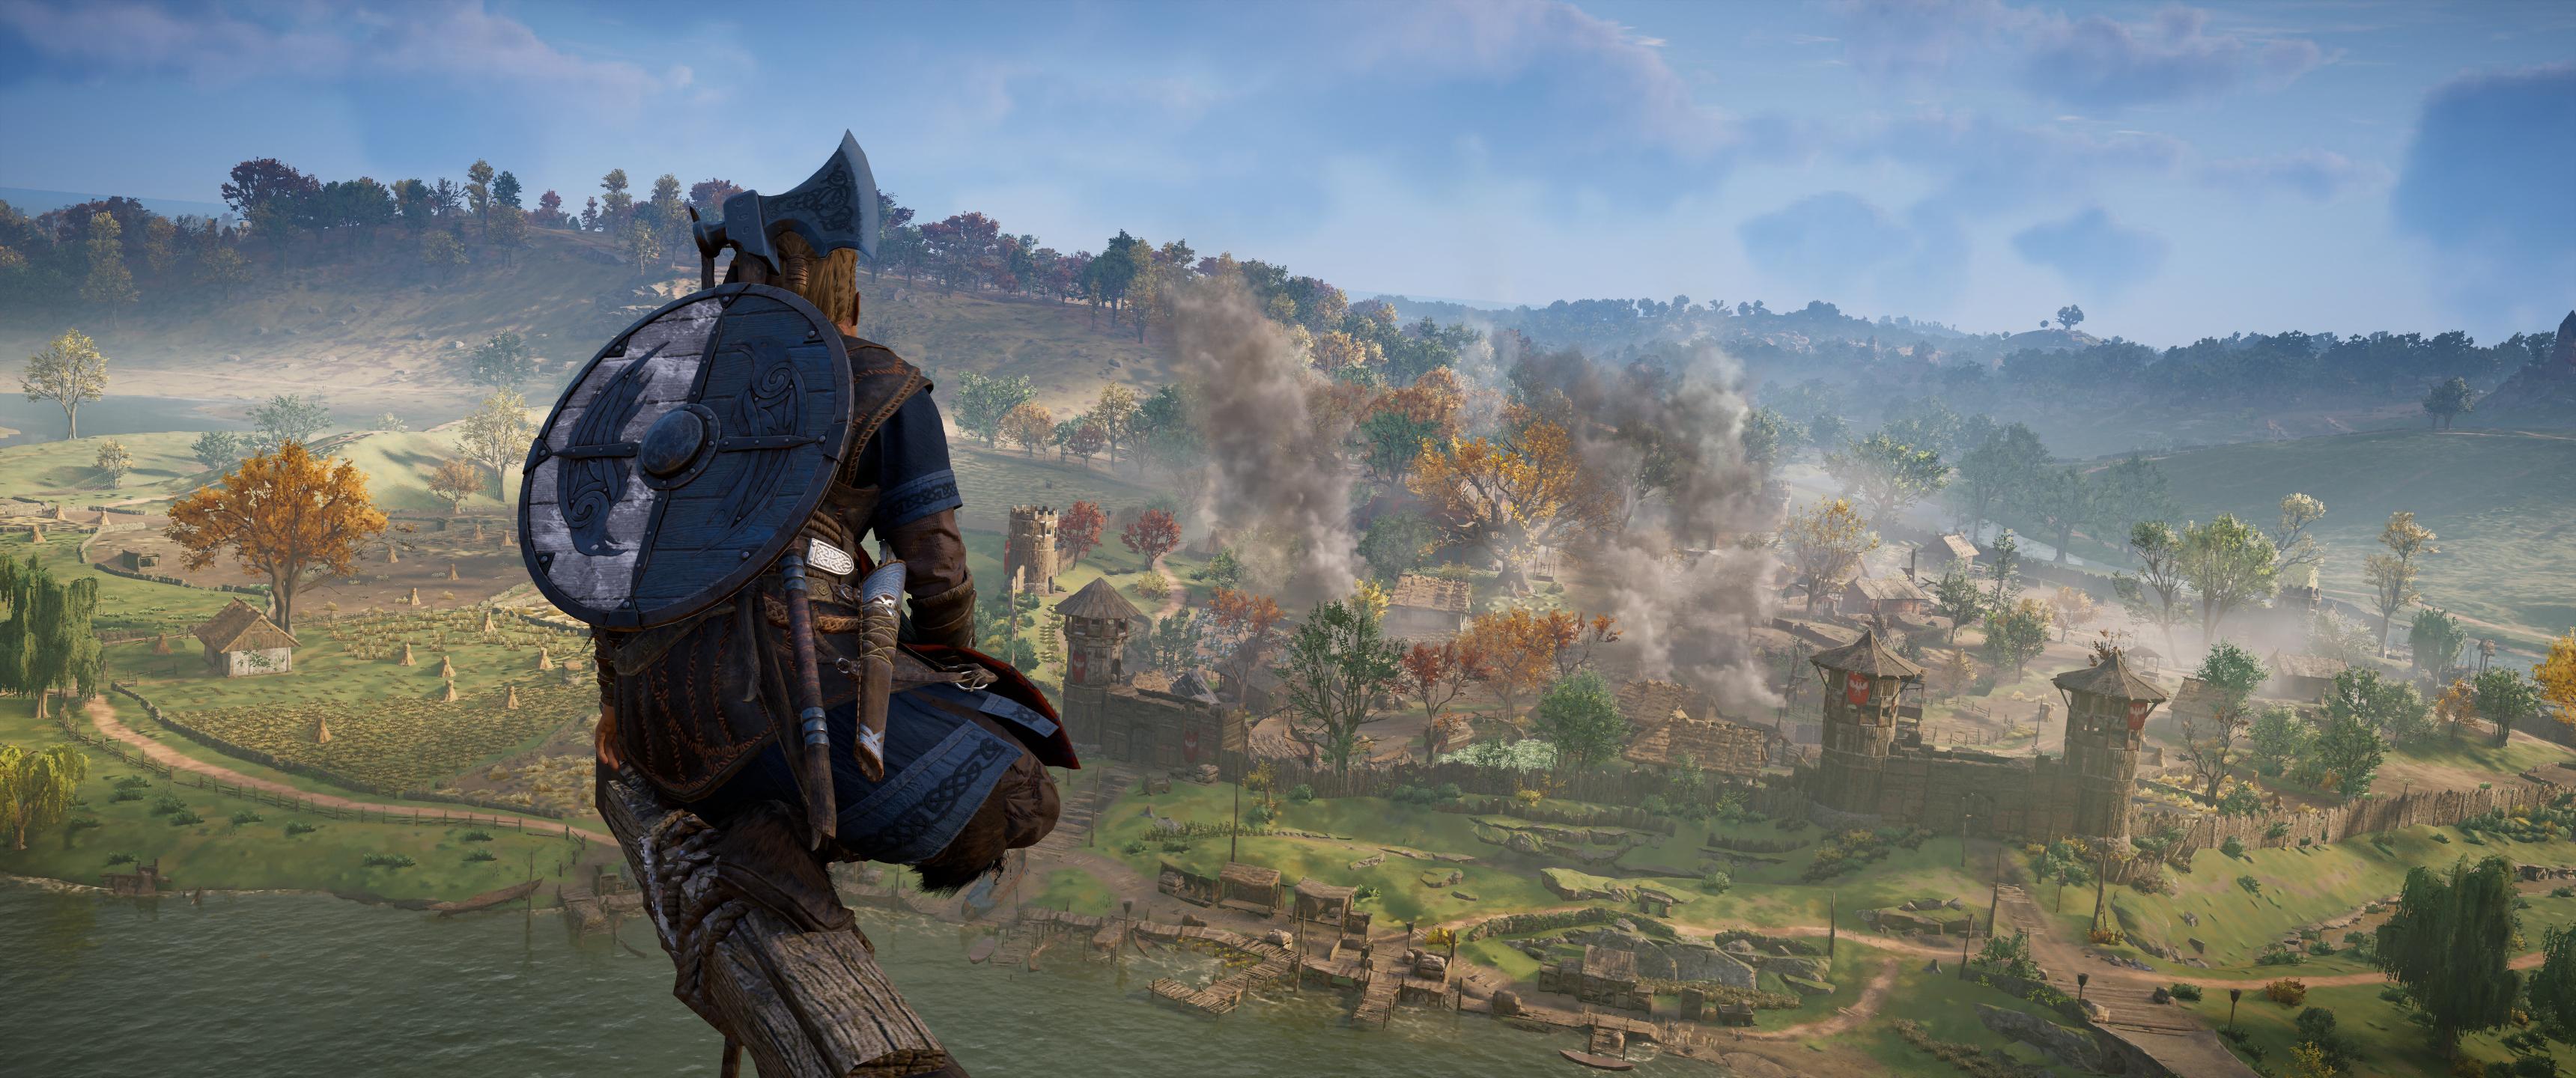 Assassin-s-Creed-Valhalla2020-11-17-2-28